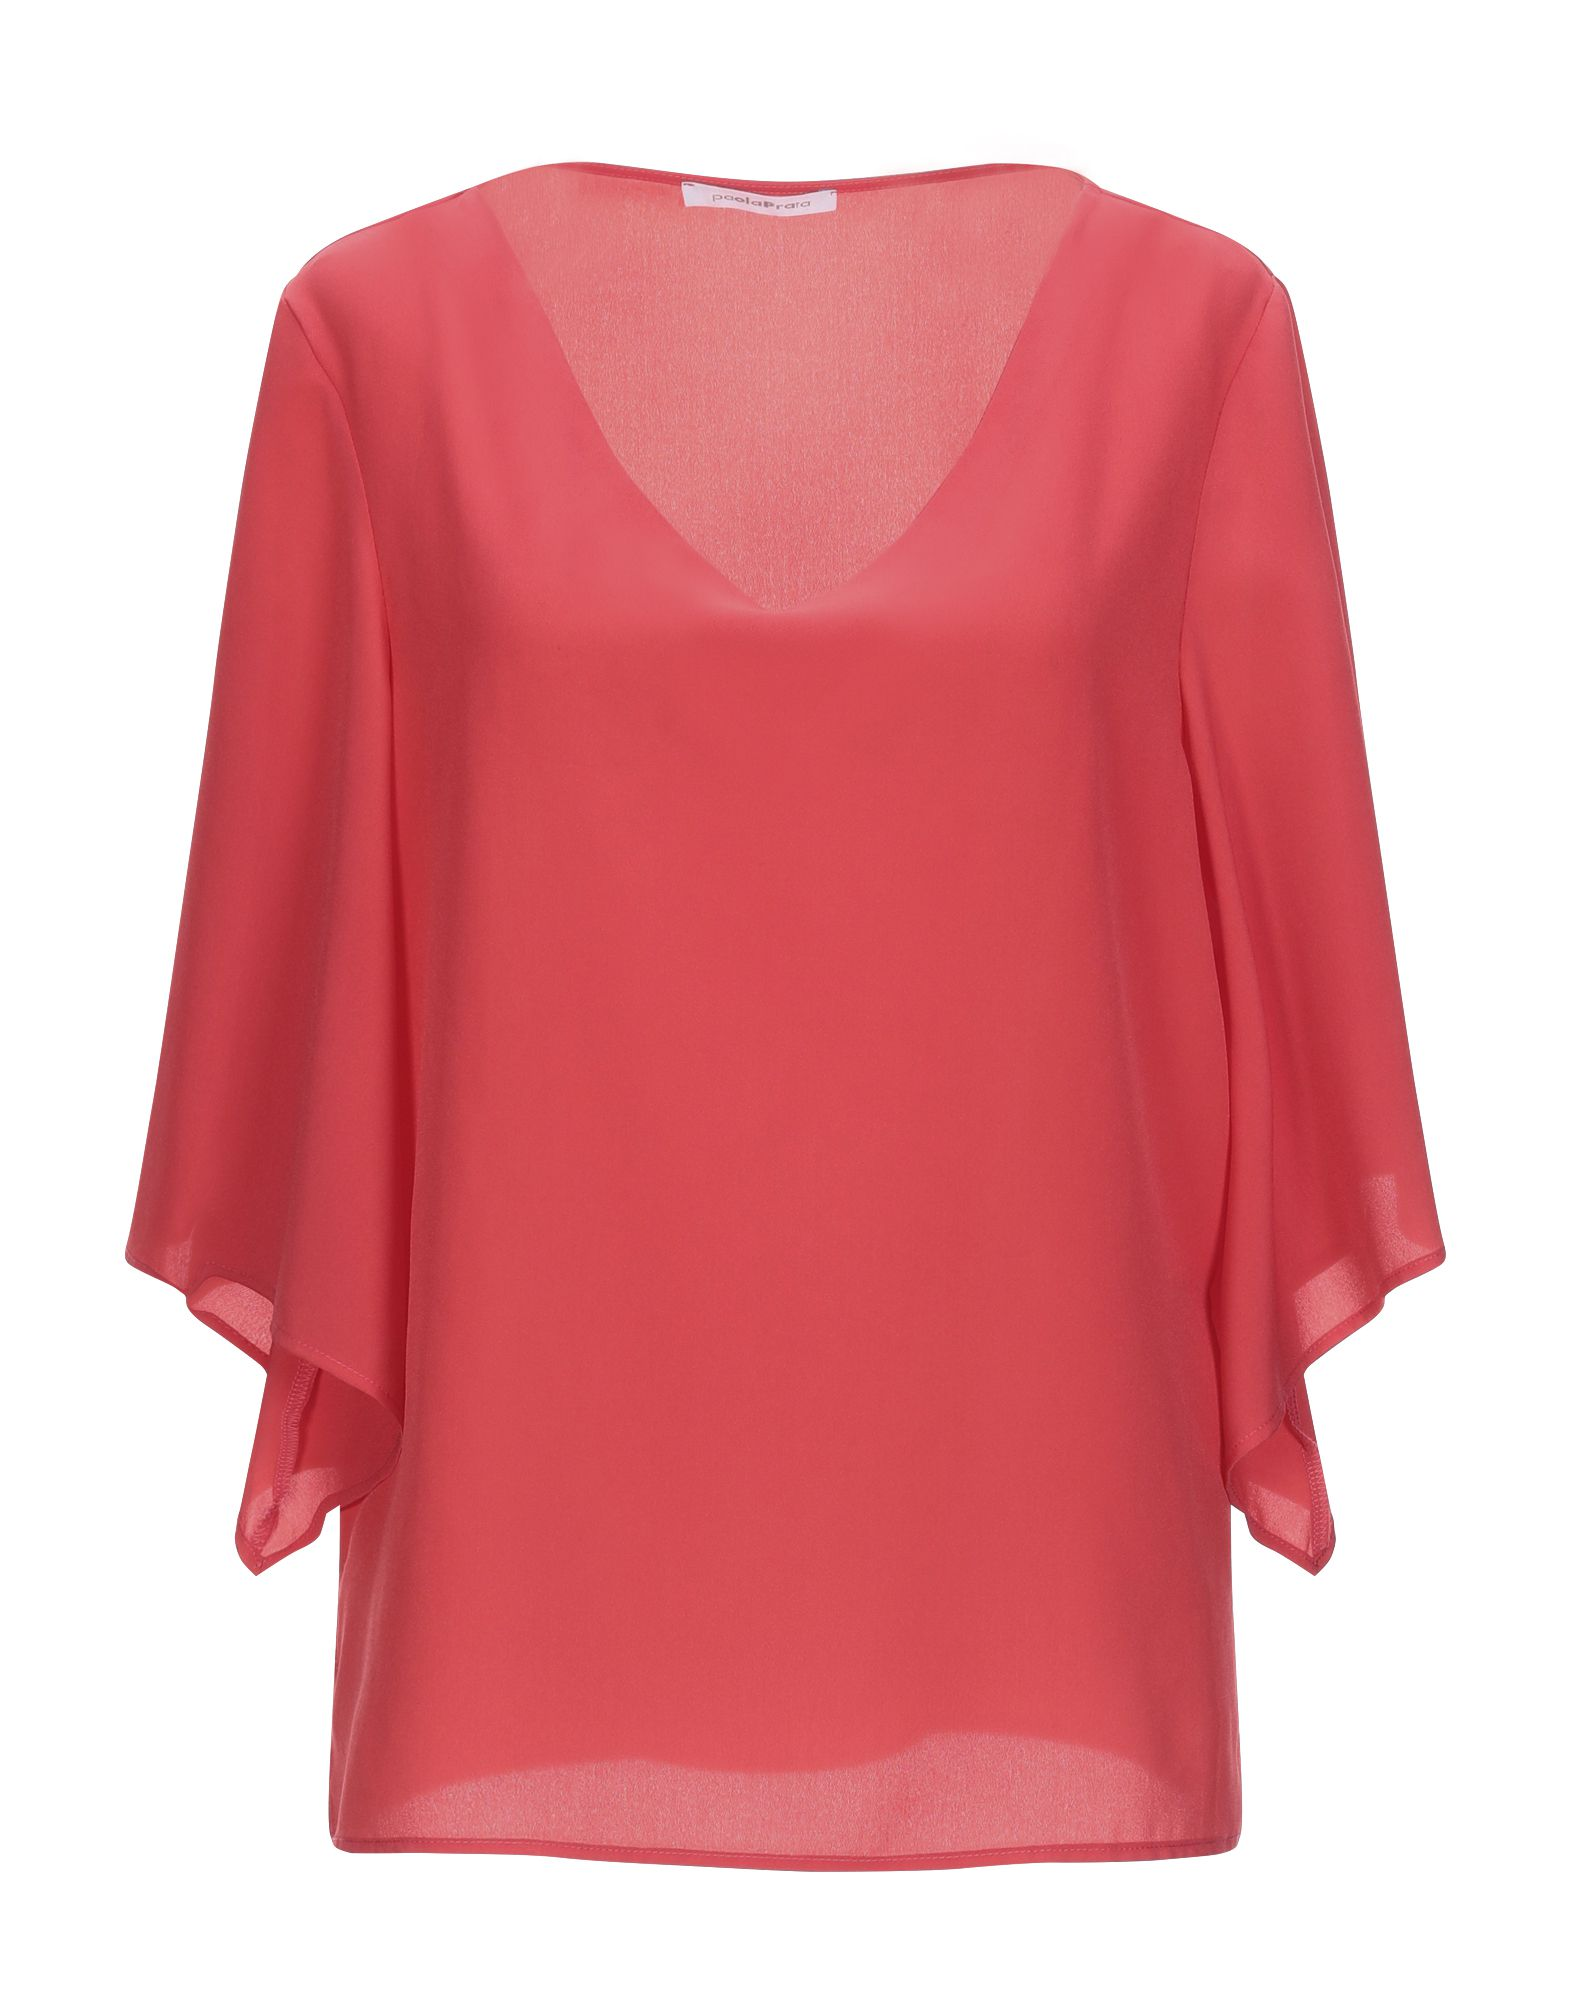 PAOLA PRATA Блузка блузка paola klingel цвет фиолетовый рисунок